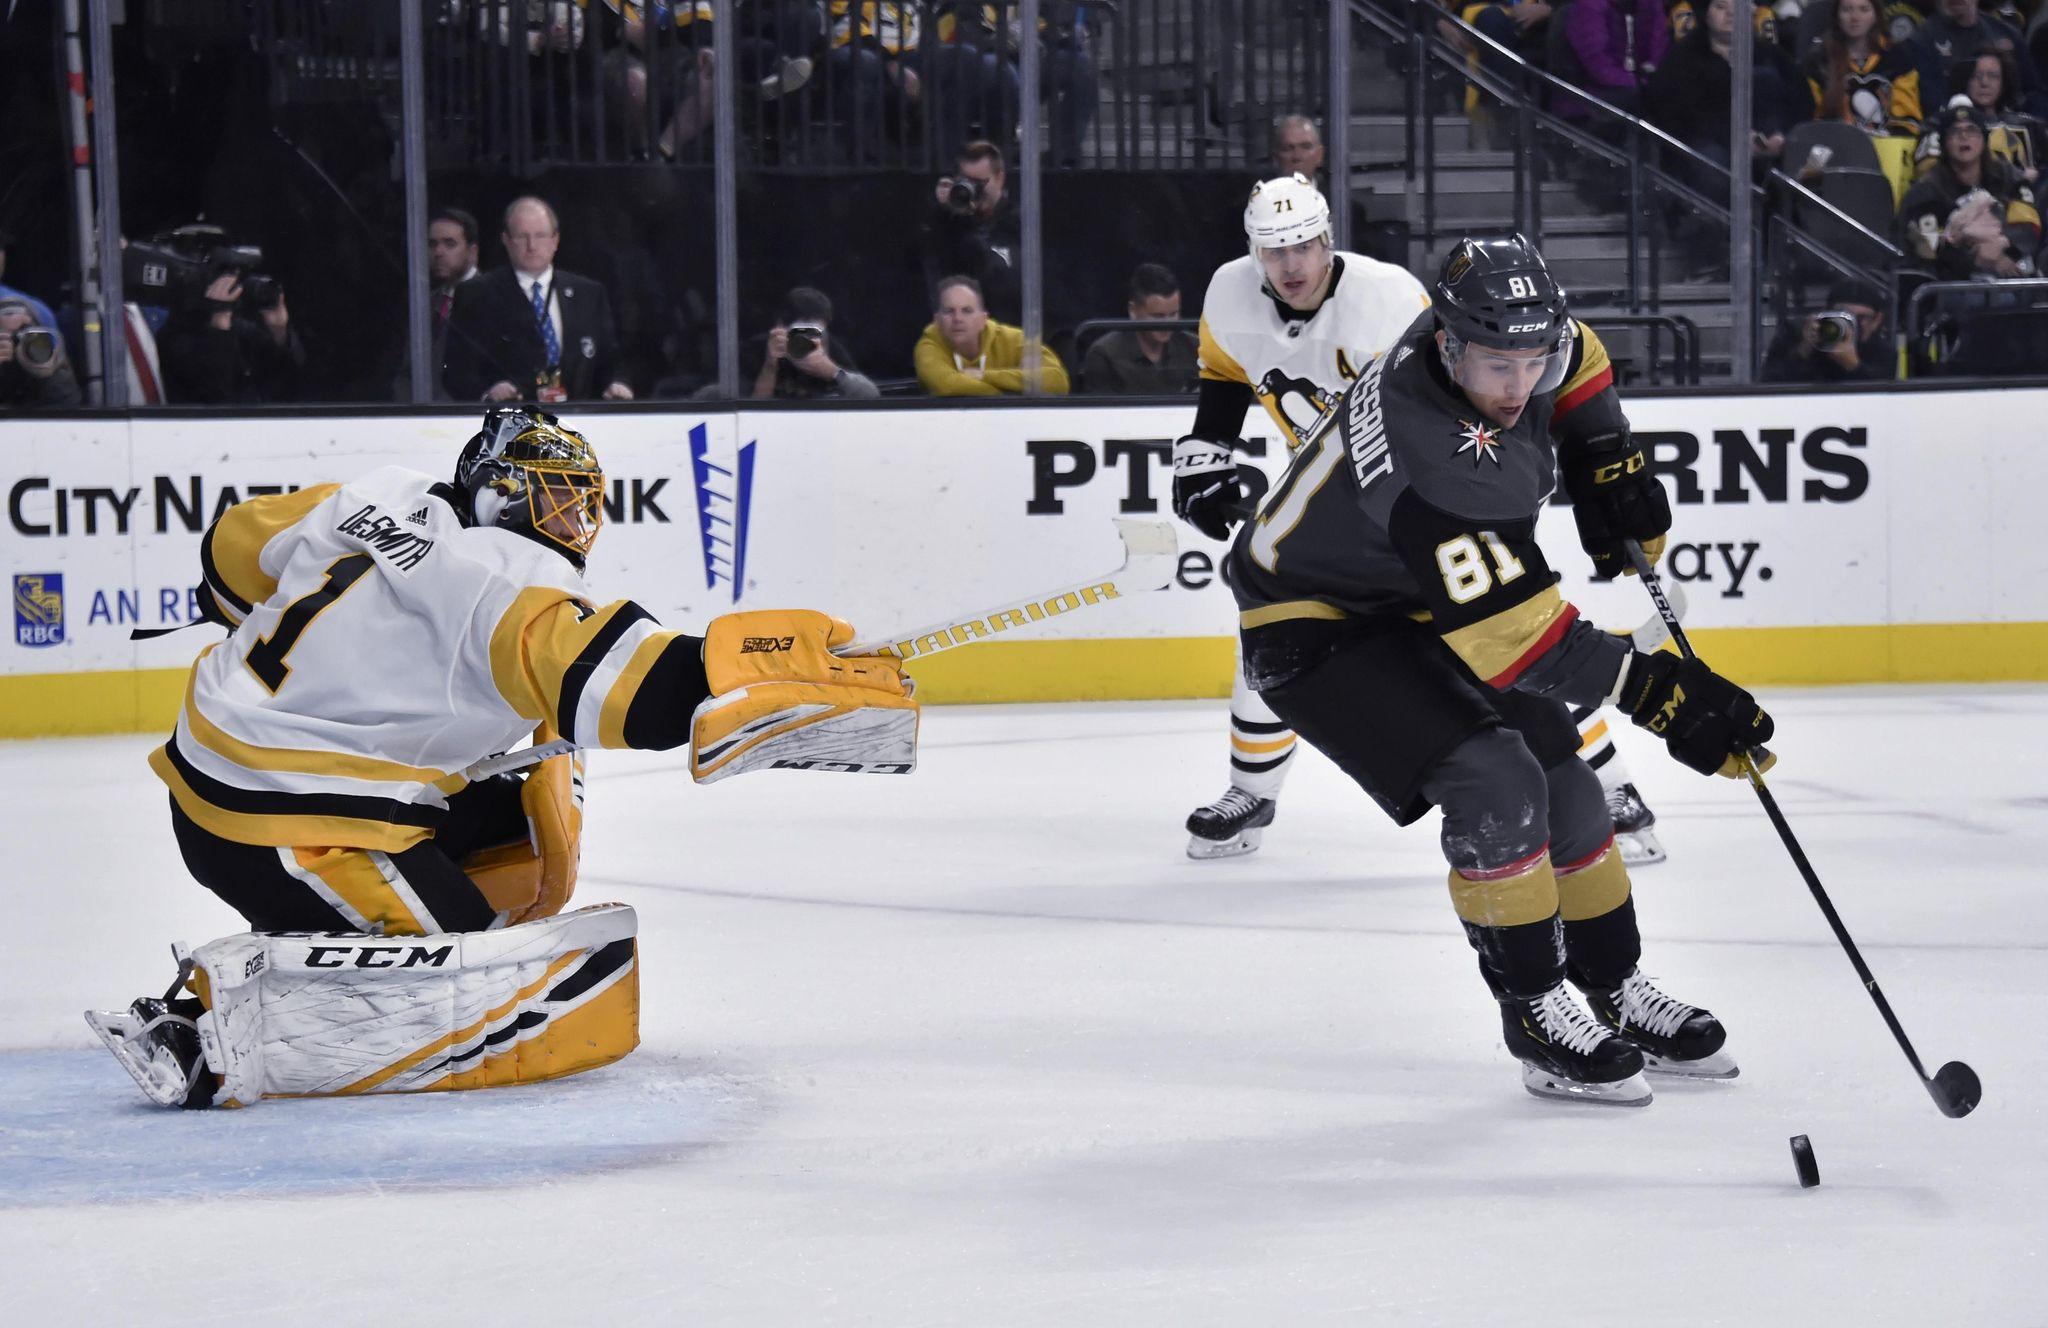 Penguins_golden_knights_hockey_78142_s2048x1328